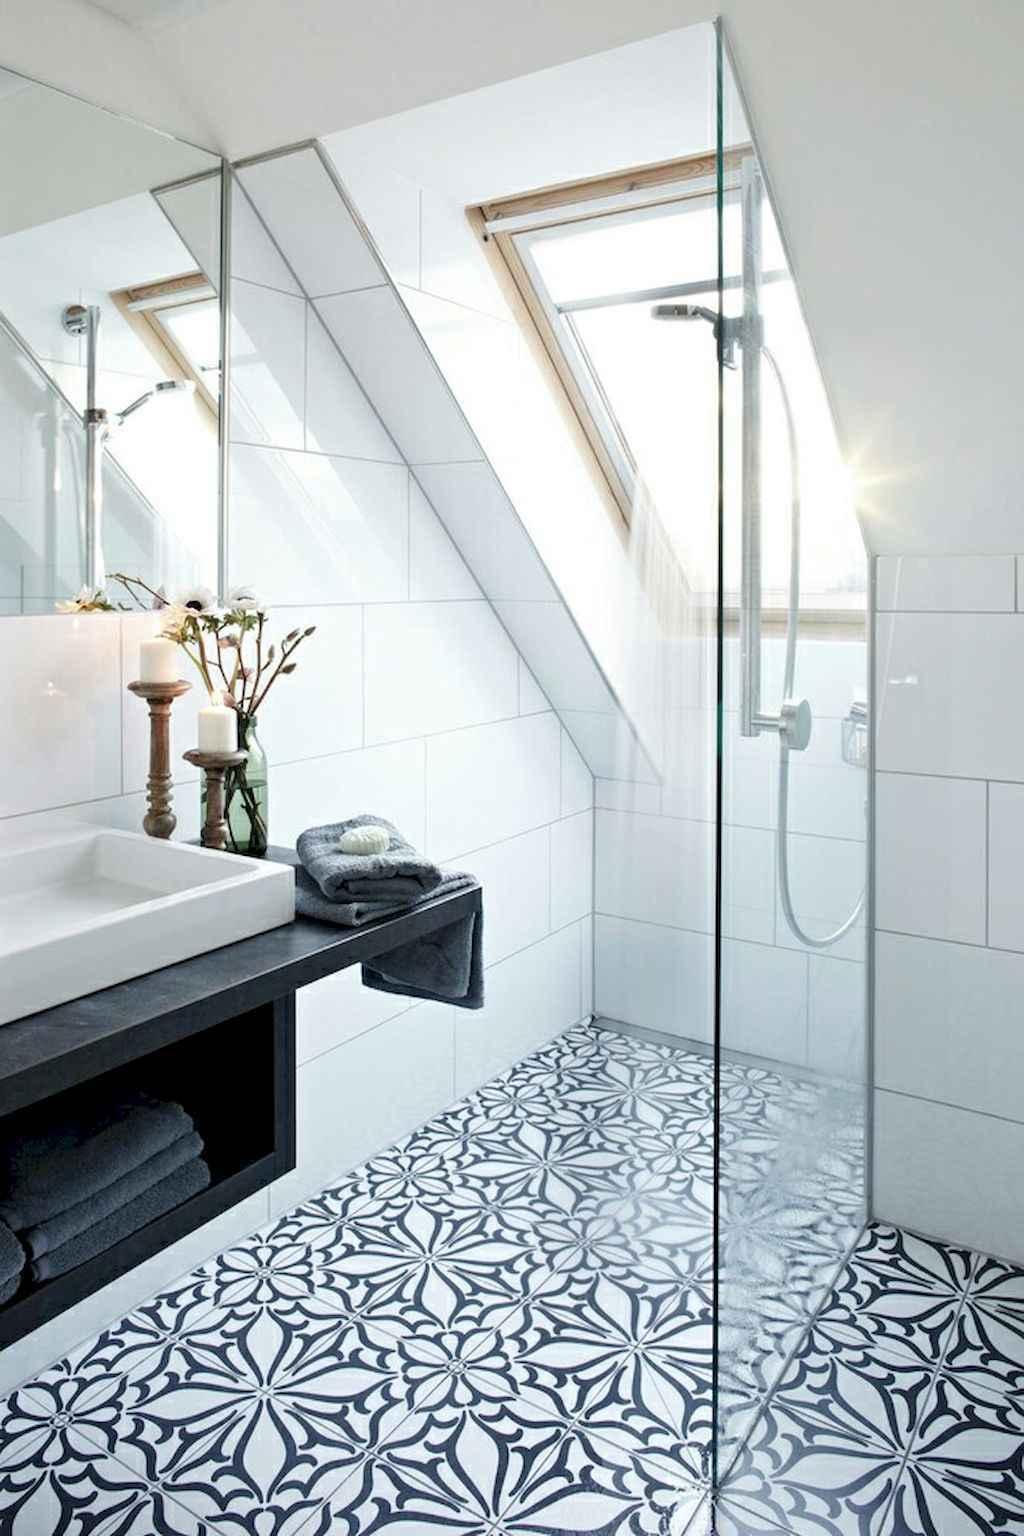 120 Stunning Bathroom Tile Shower Ideas (28) - CoachDecor.com